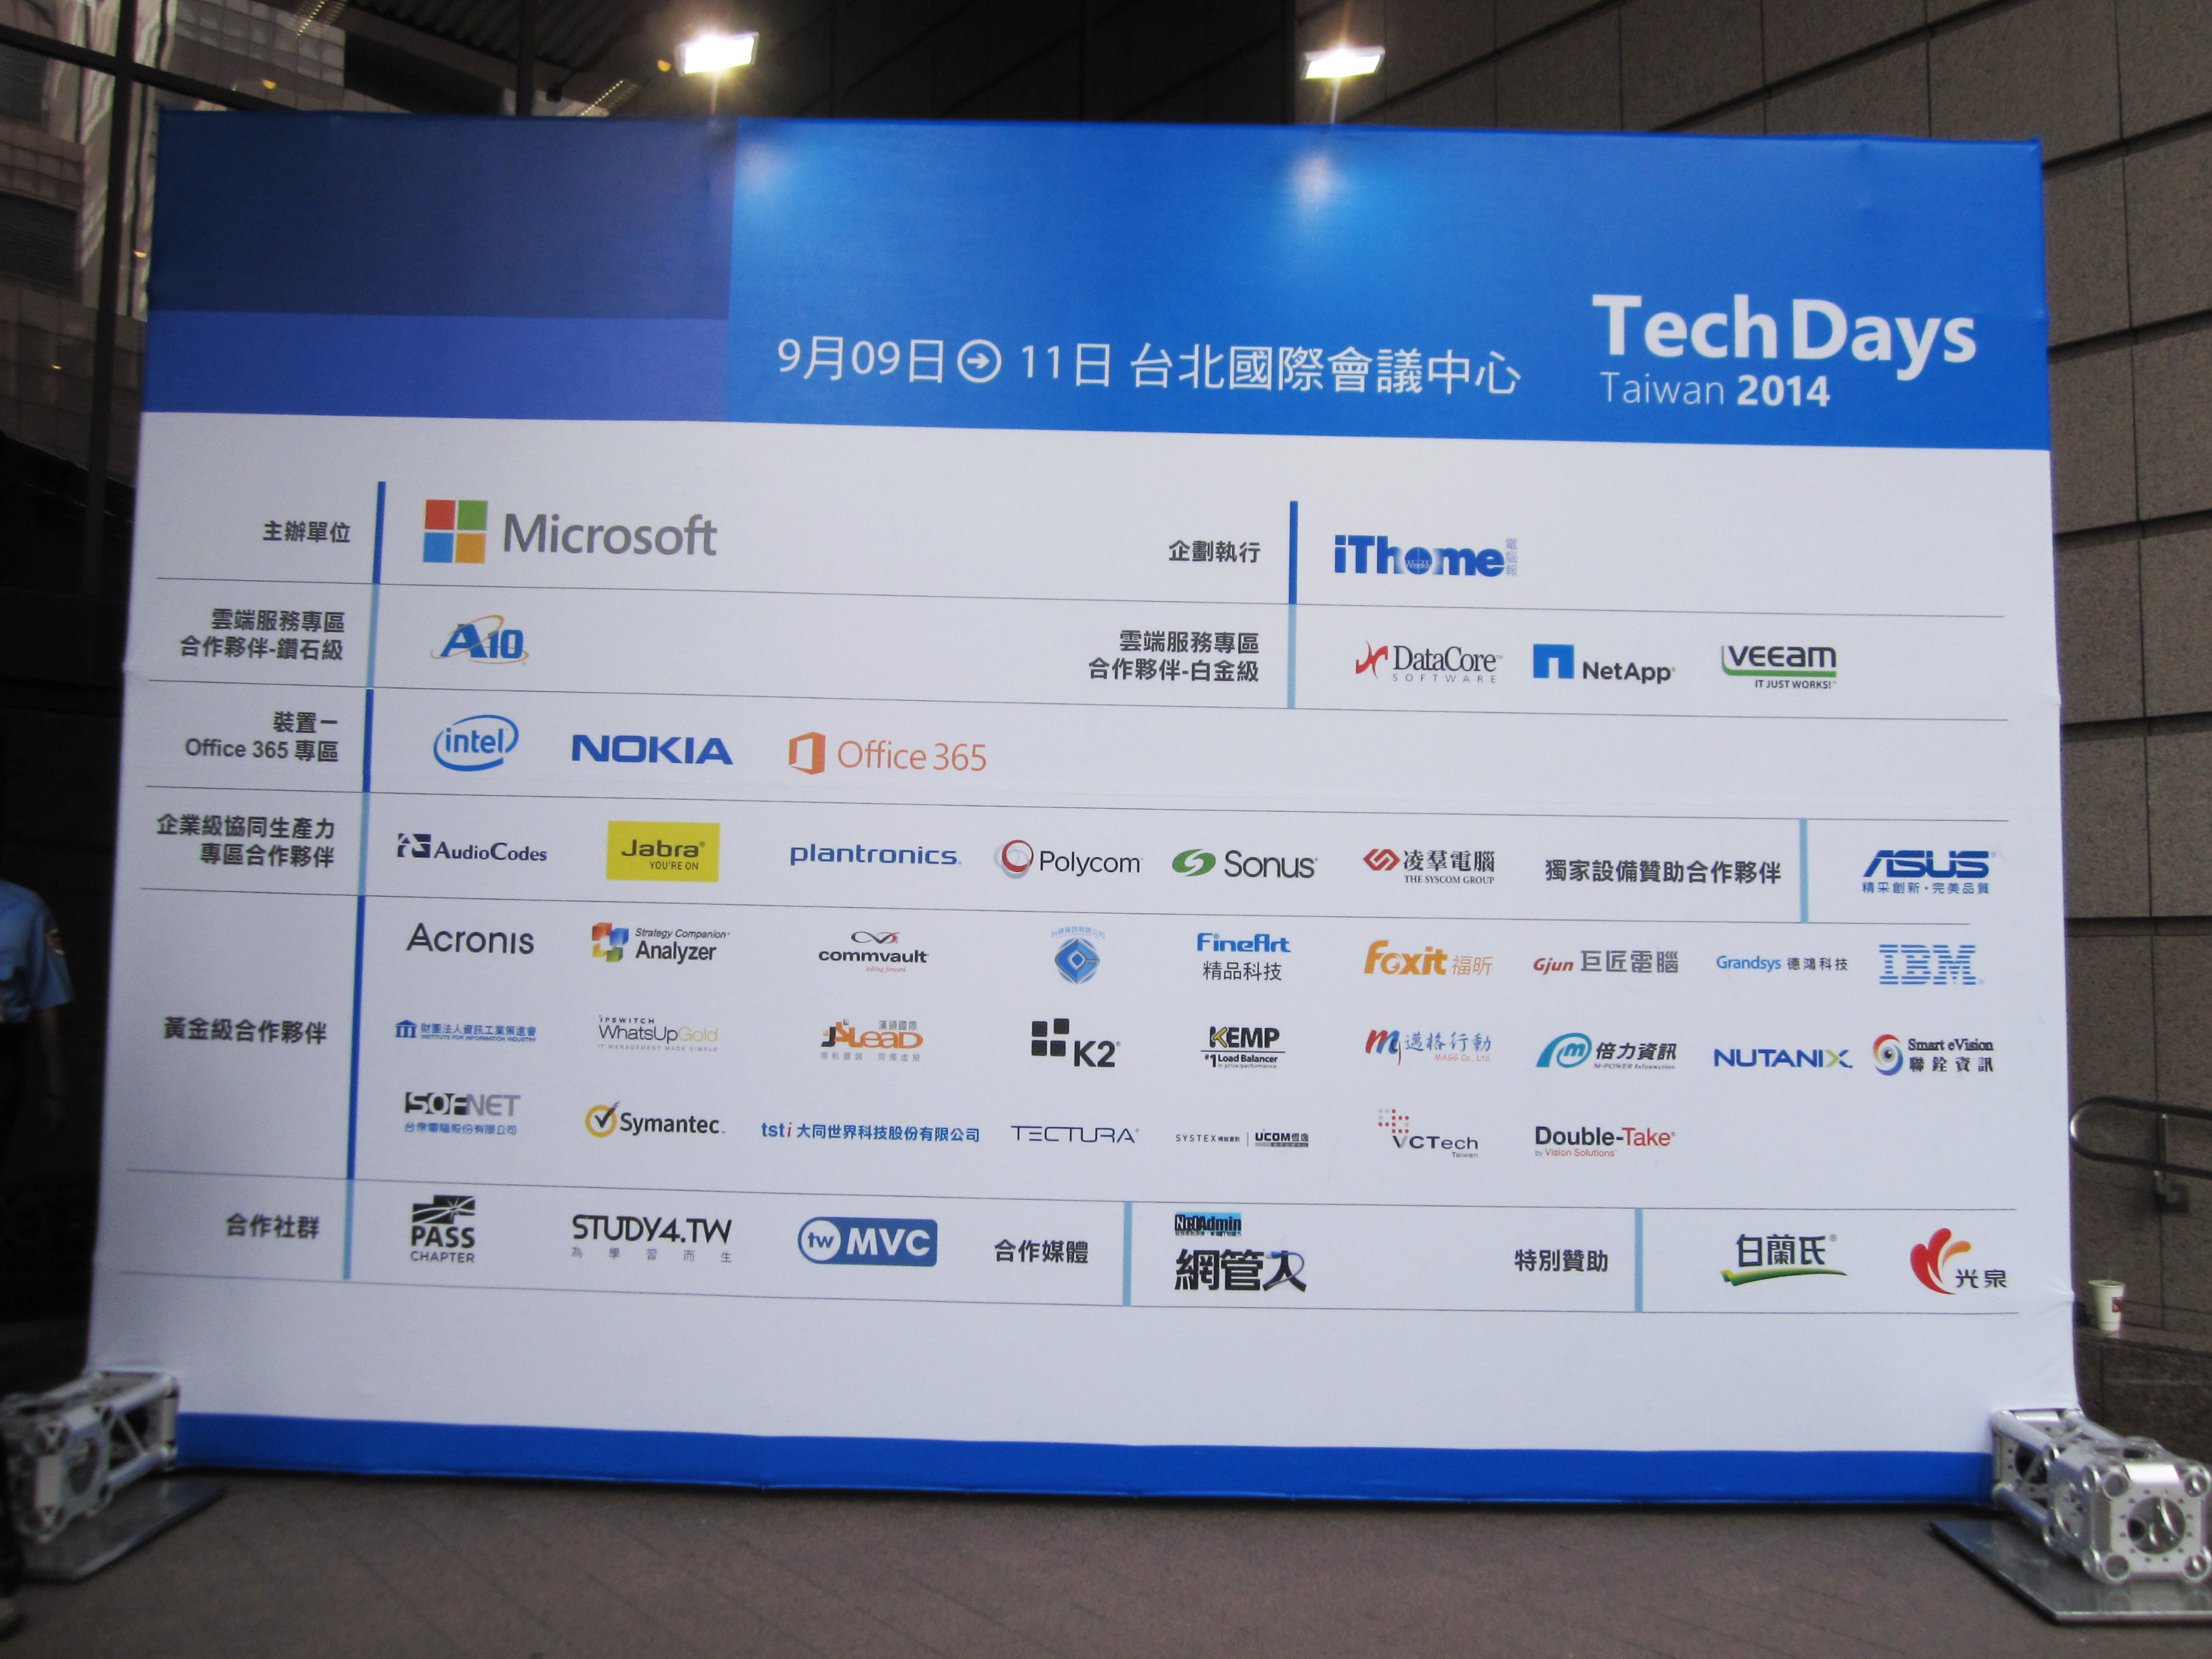 2014 Microsoft TechDays - A10-2